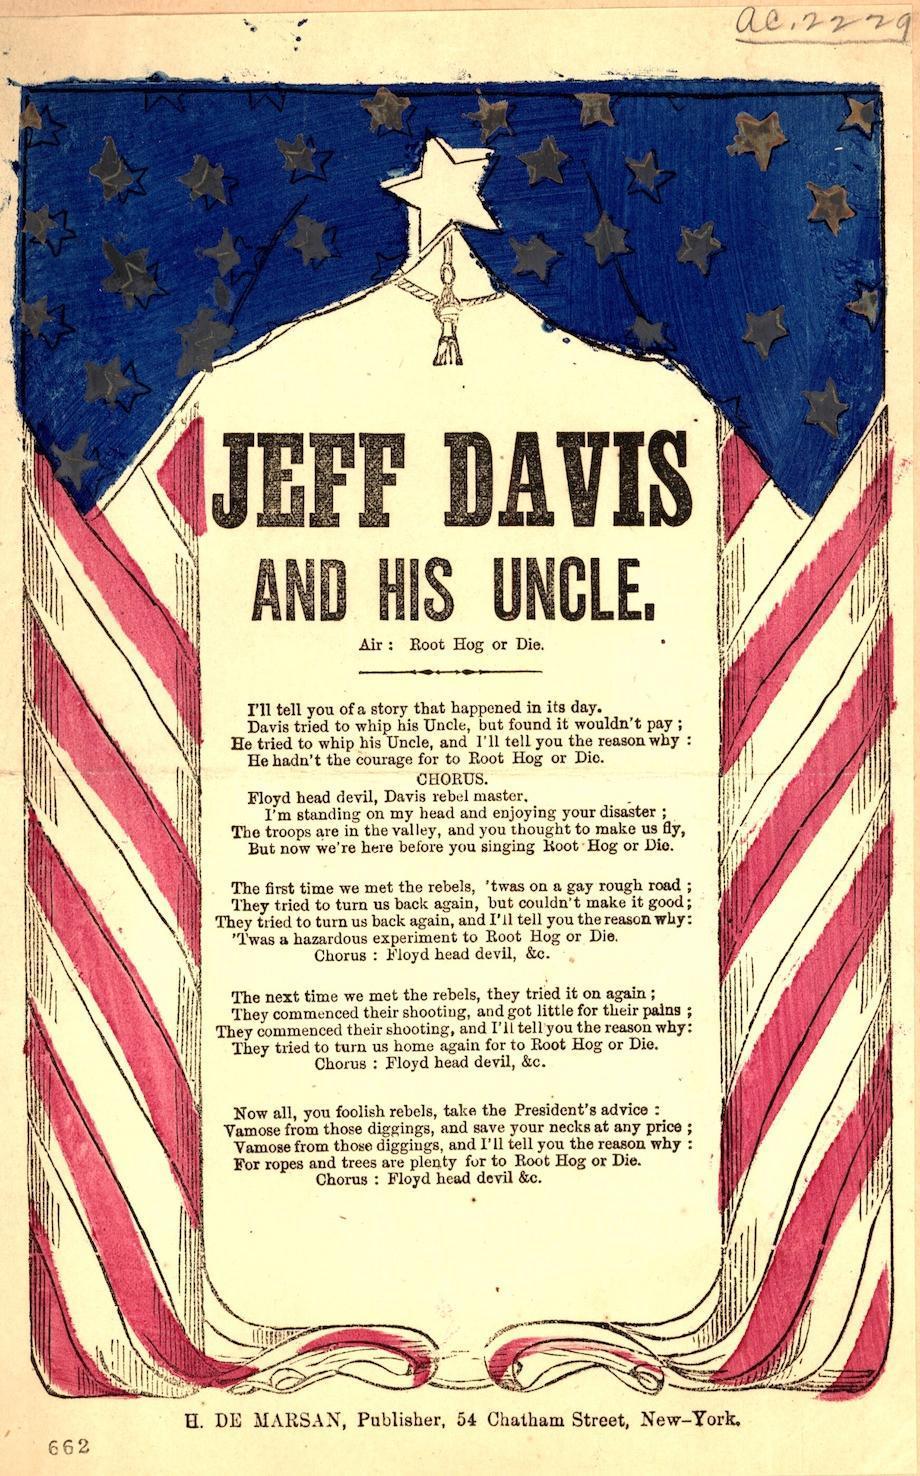 Jeff Davis ballad